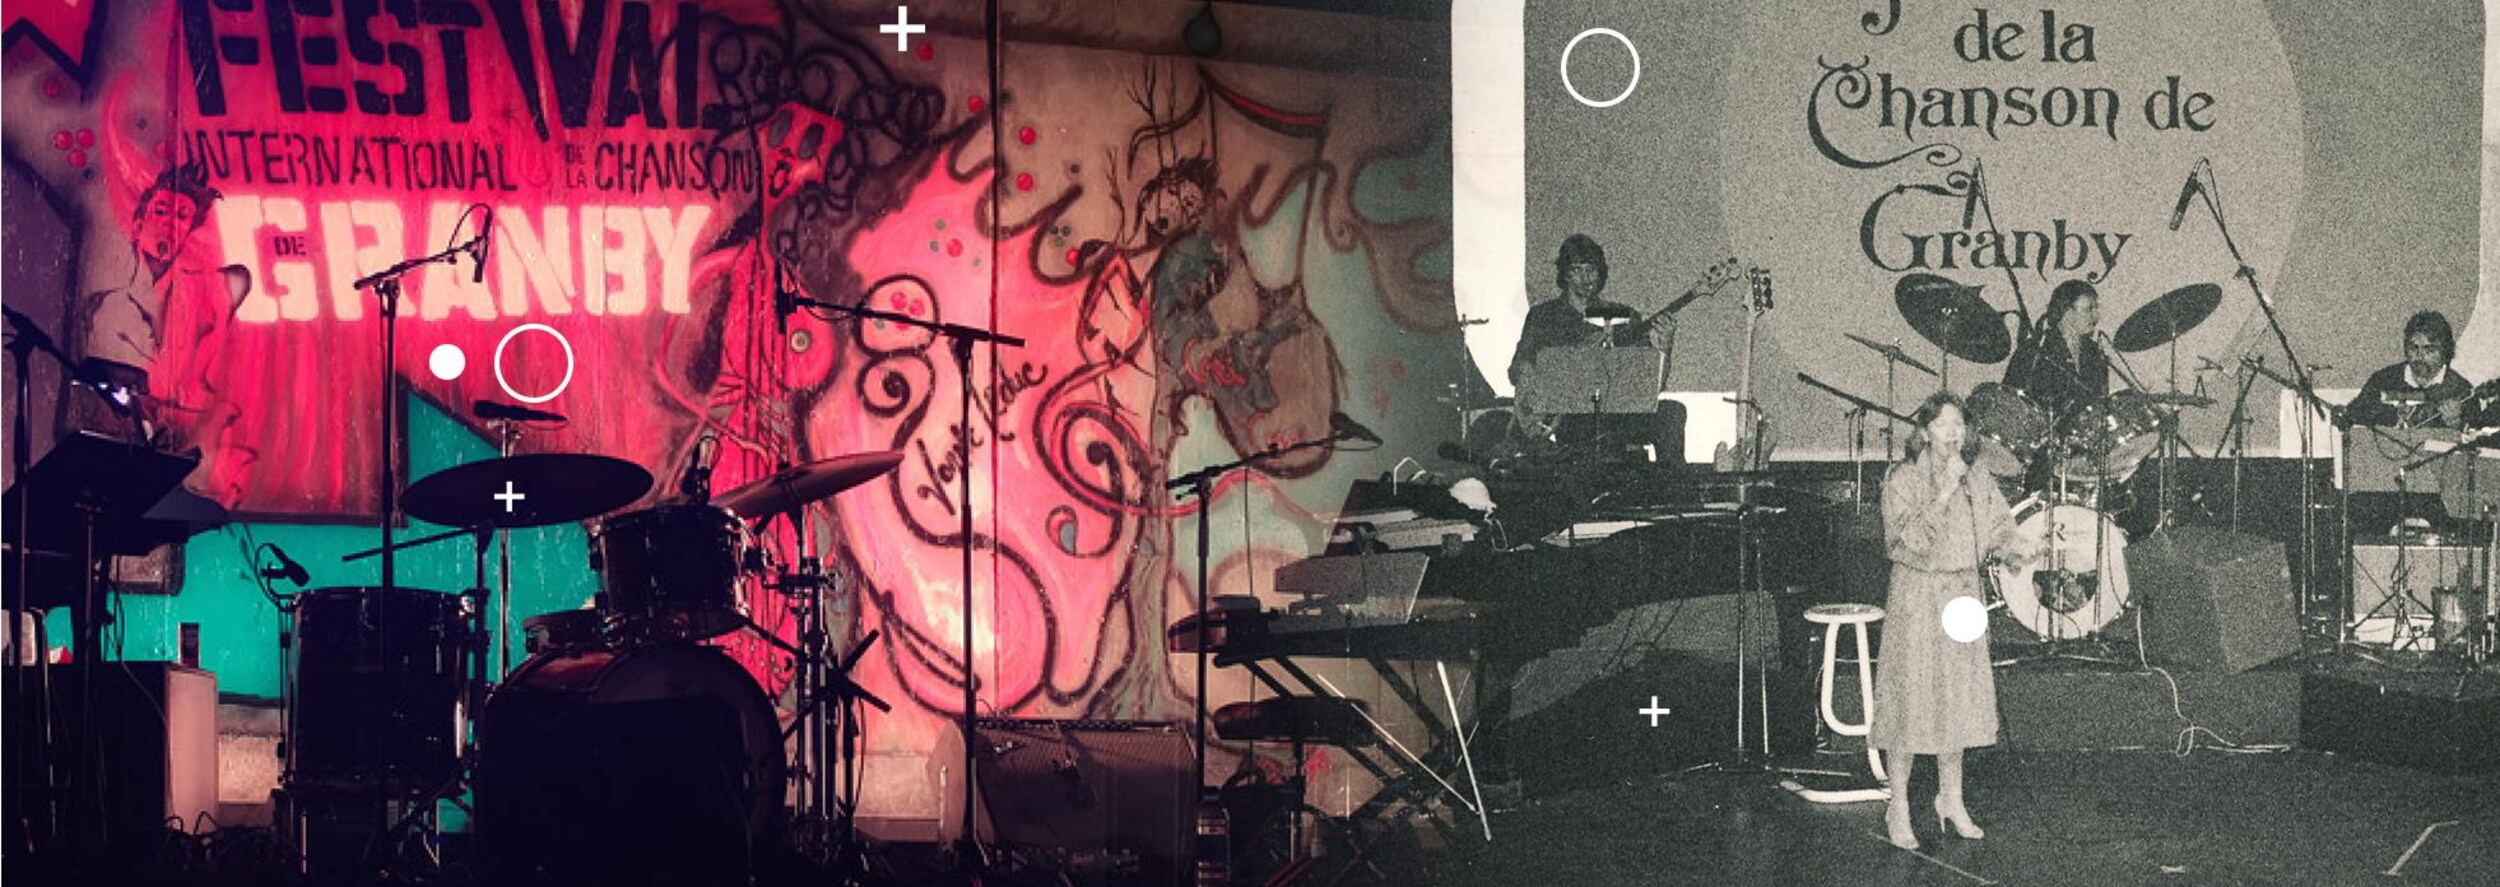 Festival de la chanson de Granby